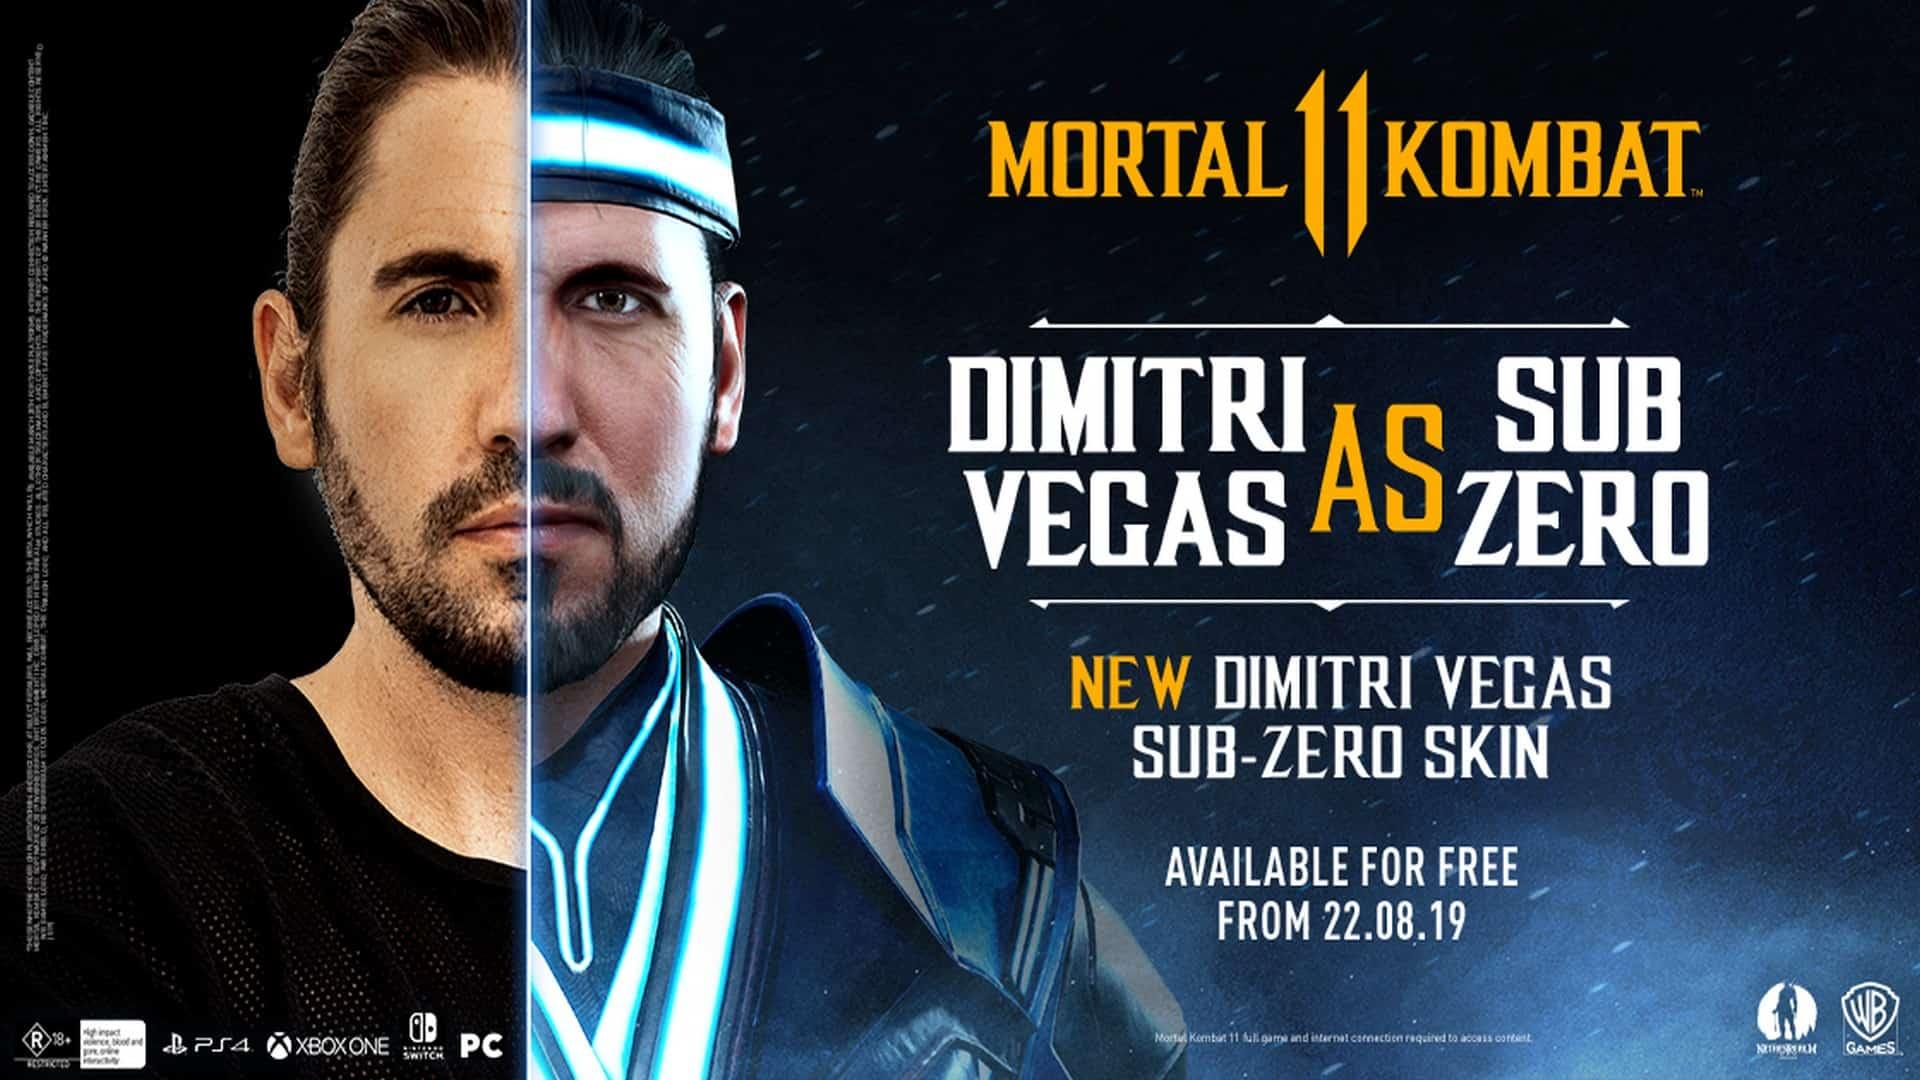 Mortal Kombat 11 Signature Sub-Zero Themed Character Skin Revealed